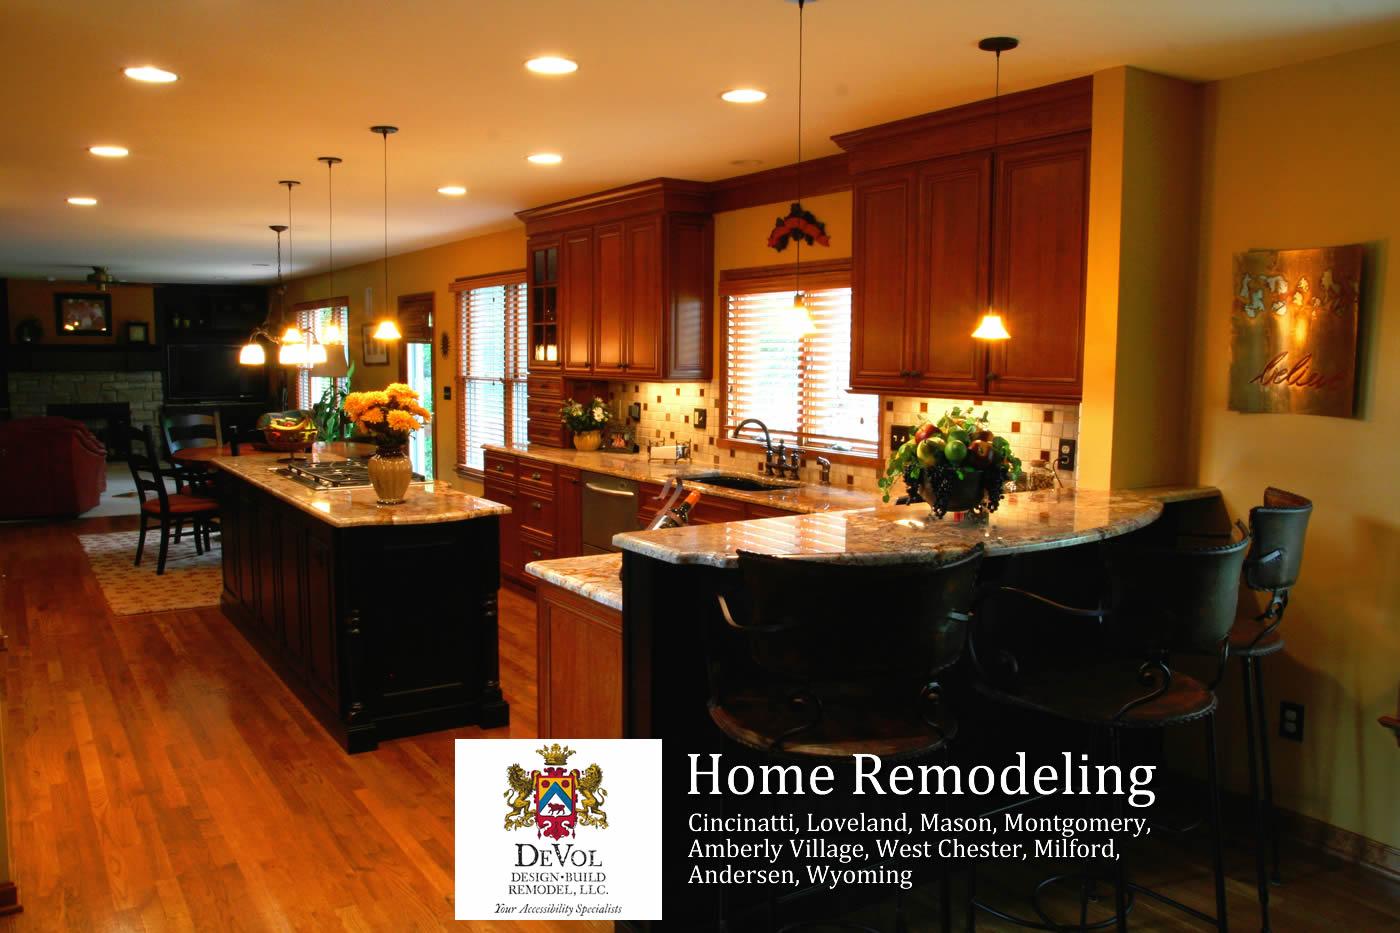 General Remodeling Services